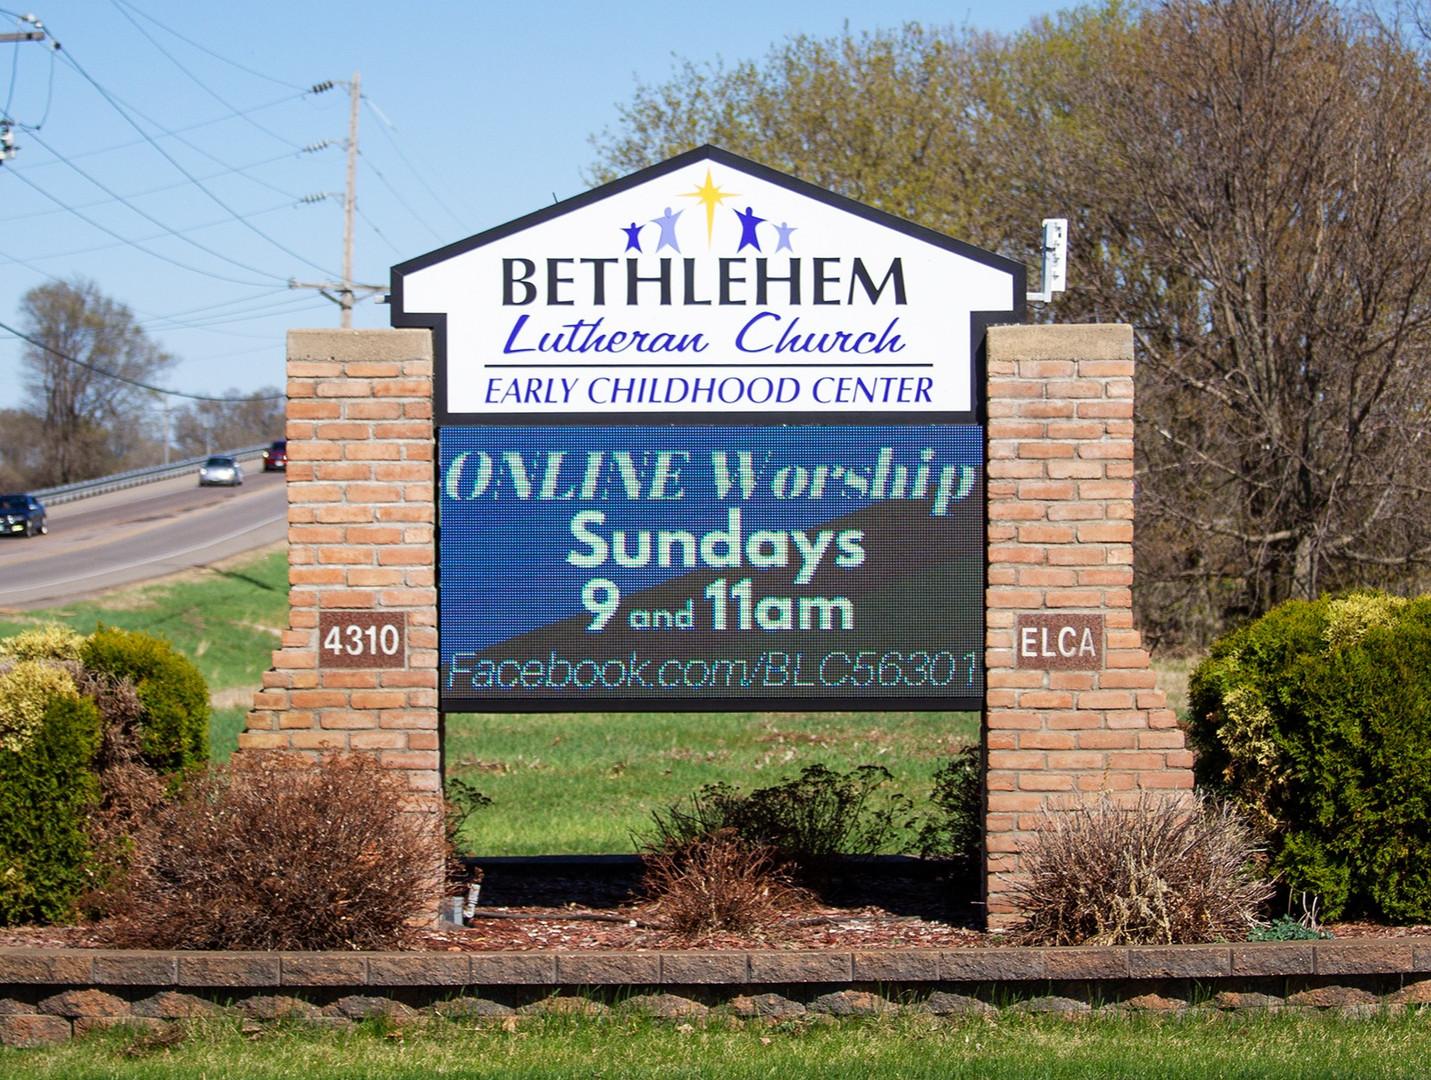 Bethlehem%20Lutheran%20Church%20St_edite